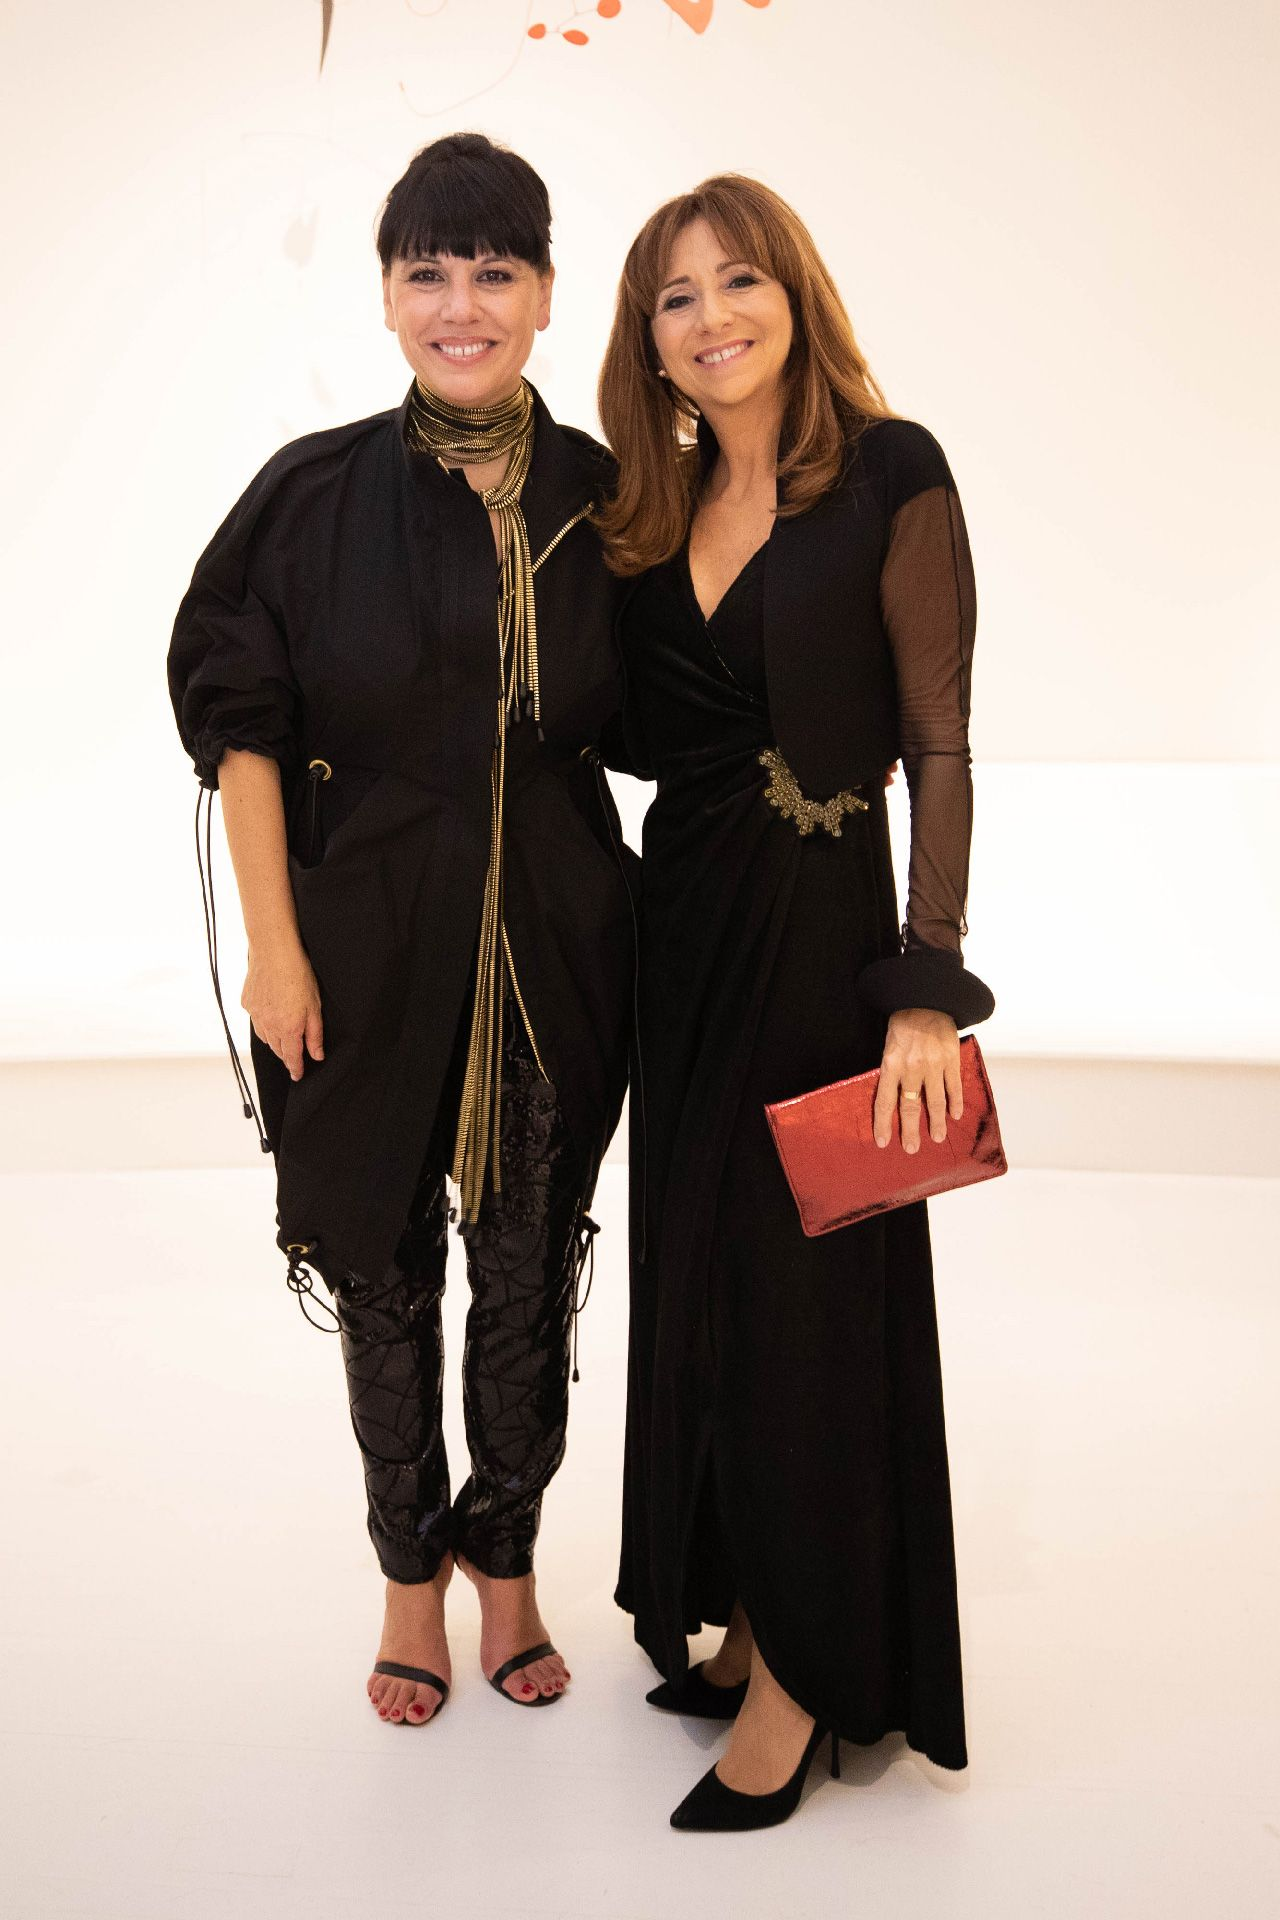 Nathalie Bondil et Nathalie Roy. Photo © Jimmy Hamelin